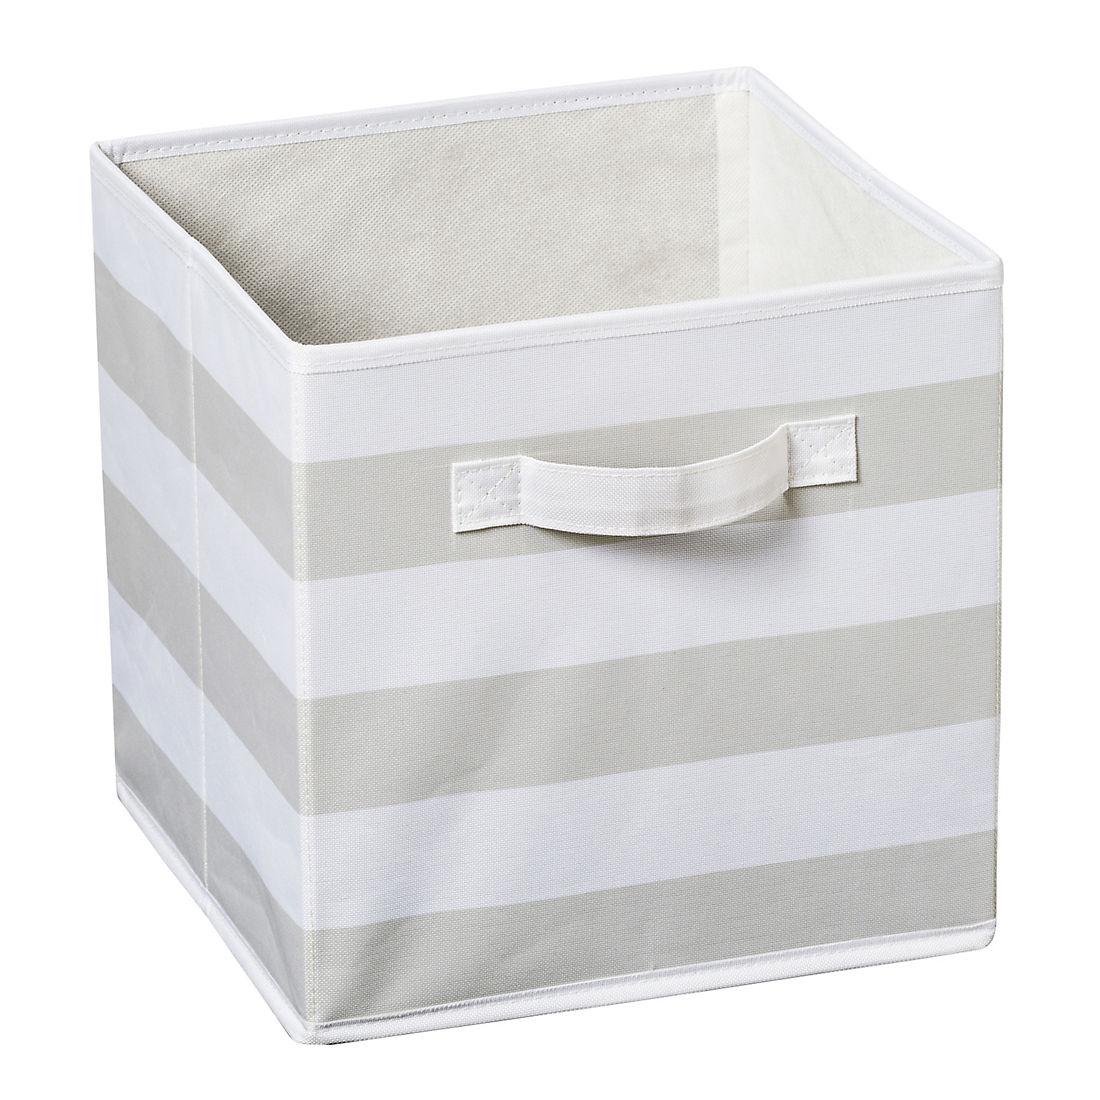 Honey-Can-Do 3-Pc. Explore + Store Kids Toy Storage Bin Set - Gray Stripe